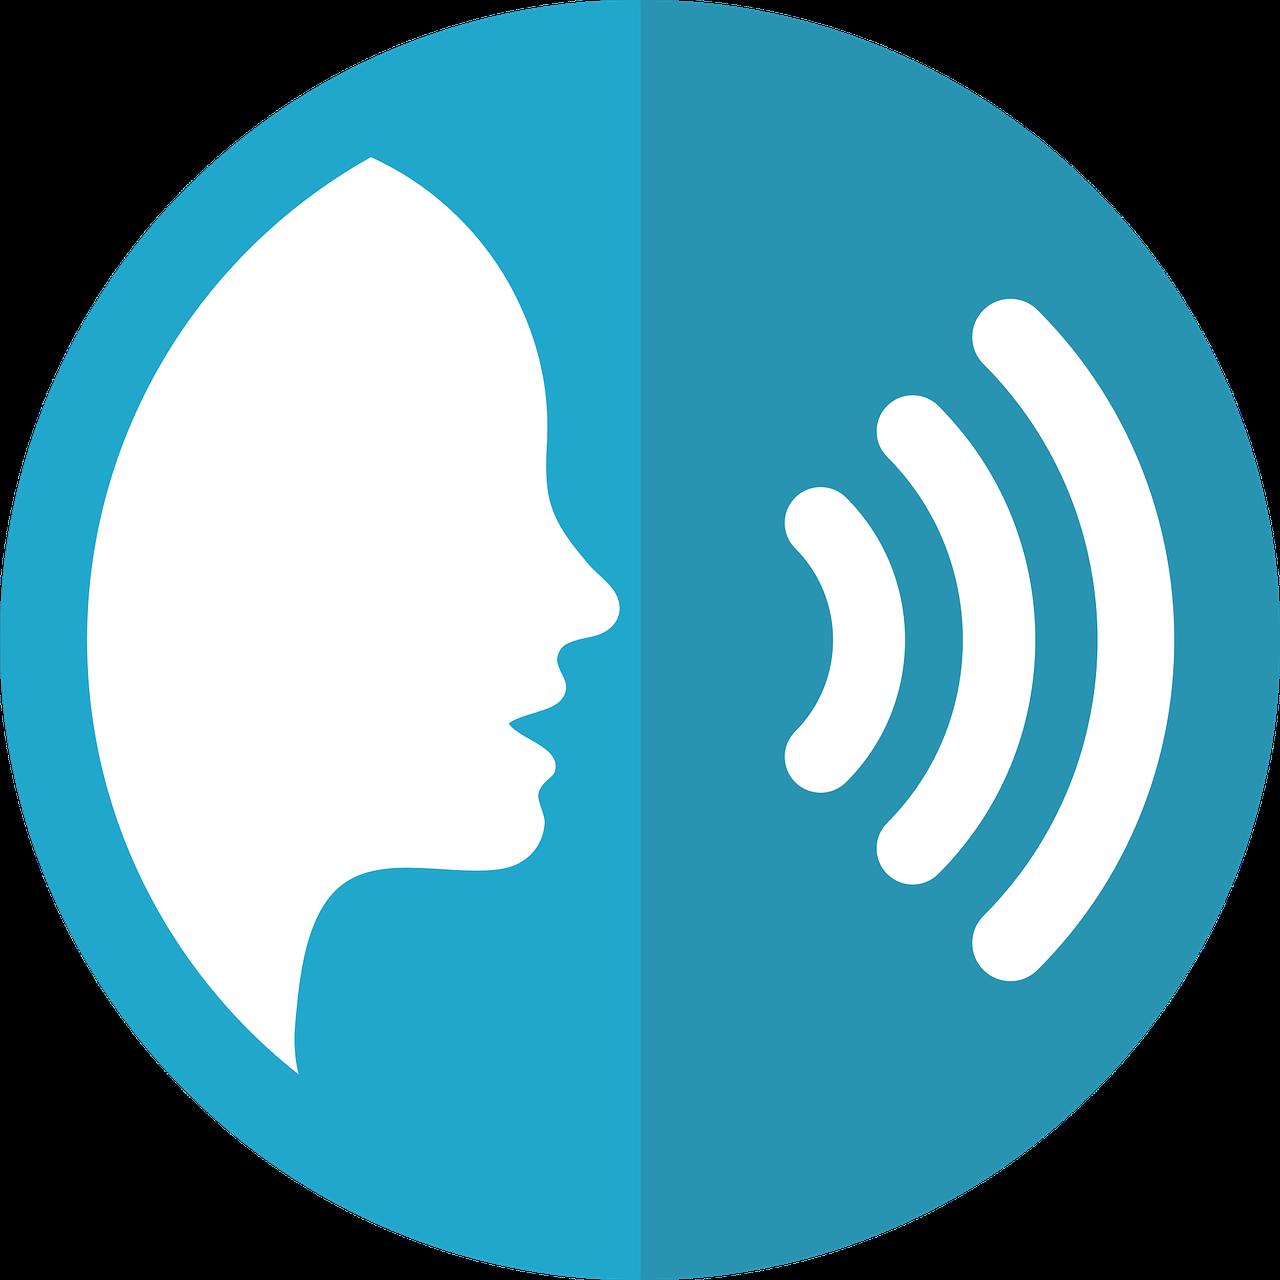 Alexa speech-icon